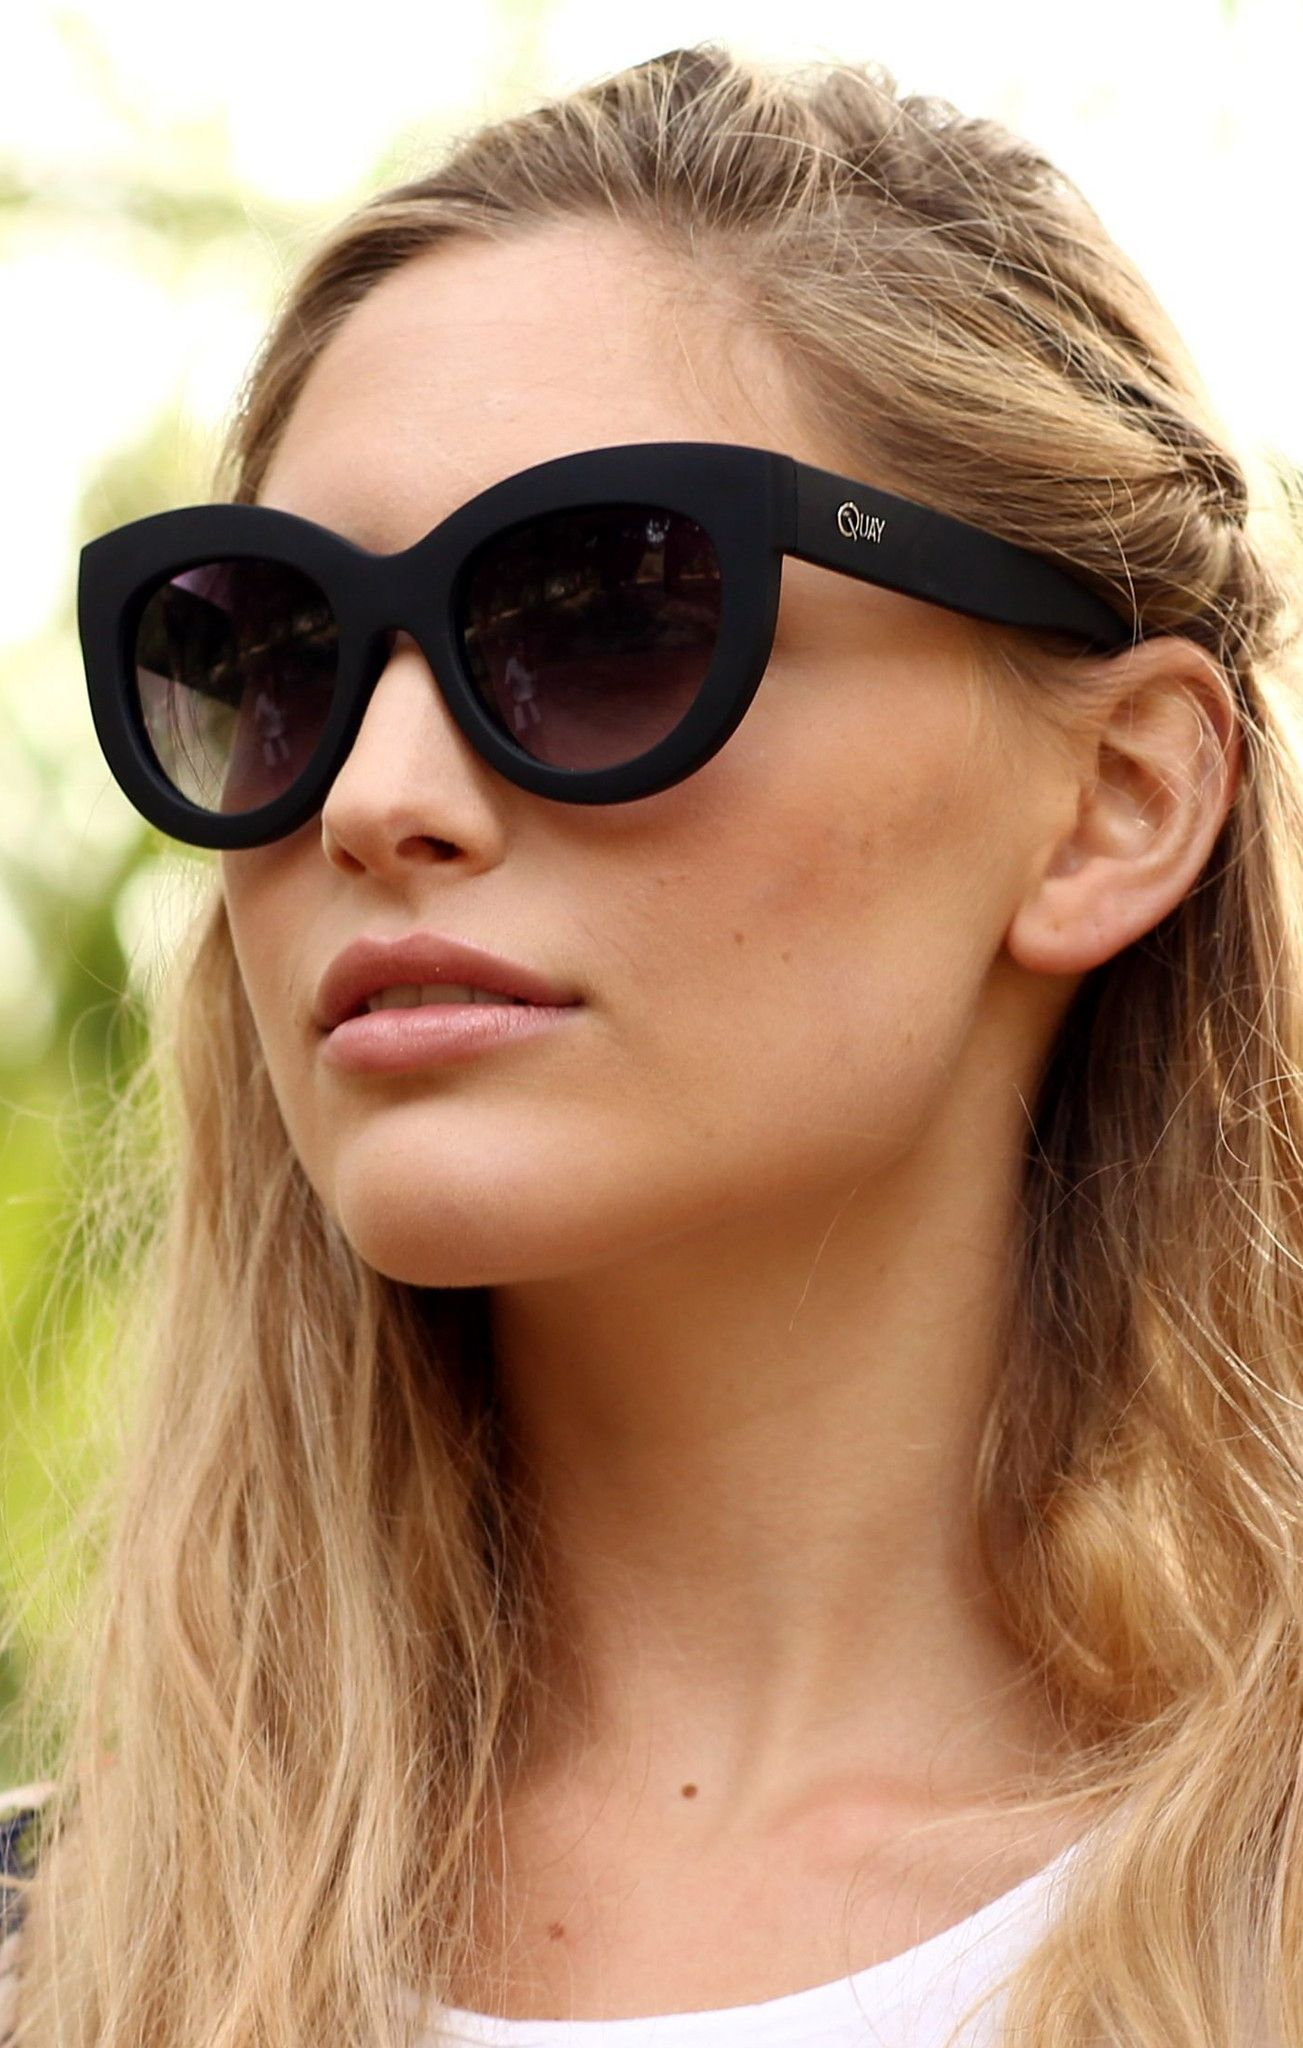 image: quay sunglasses [21]